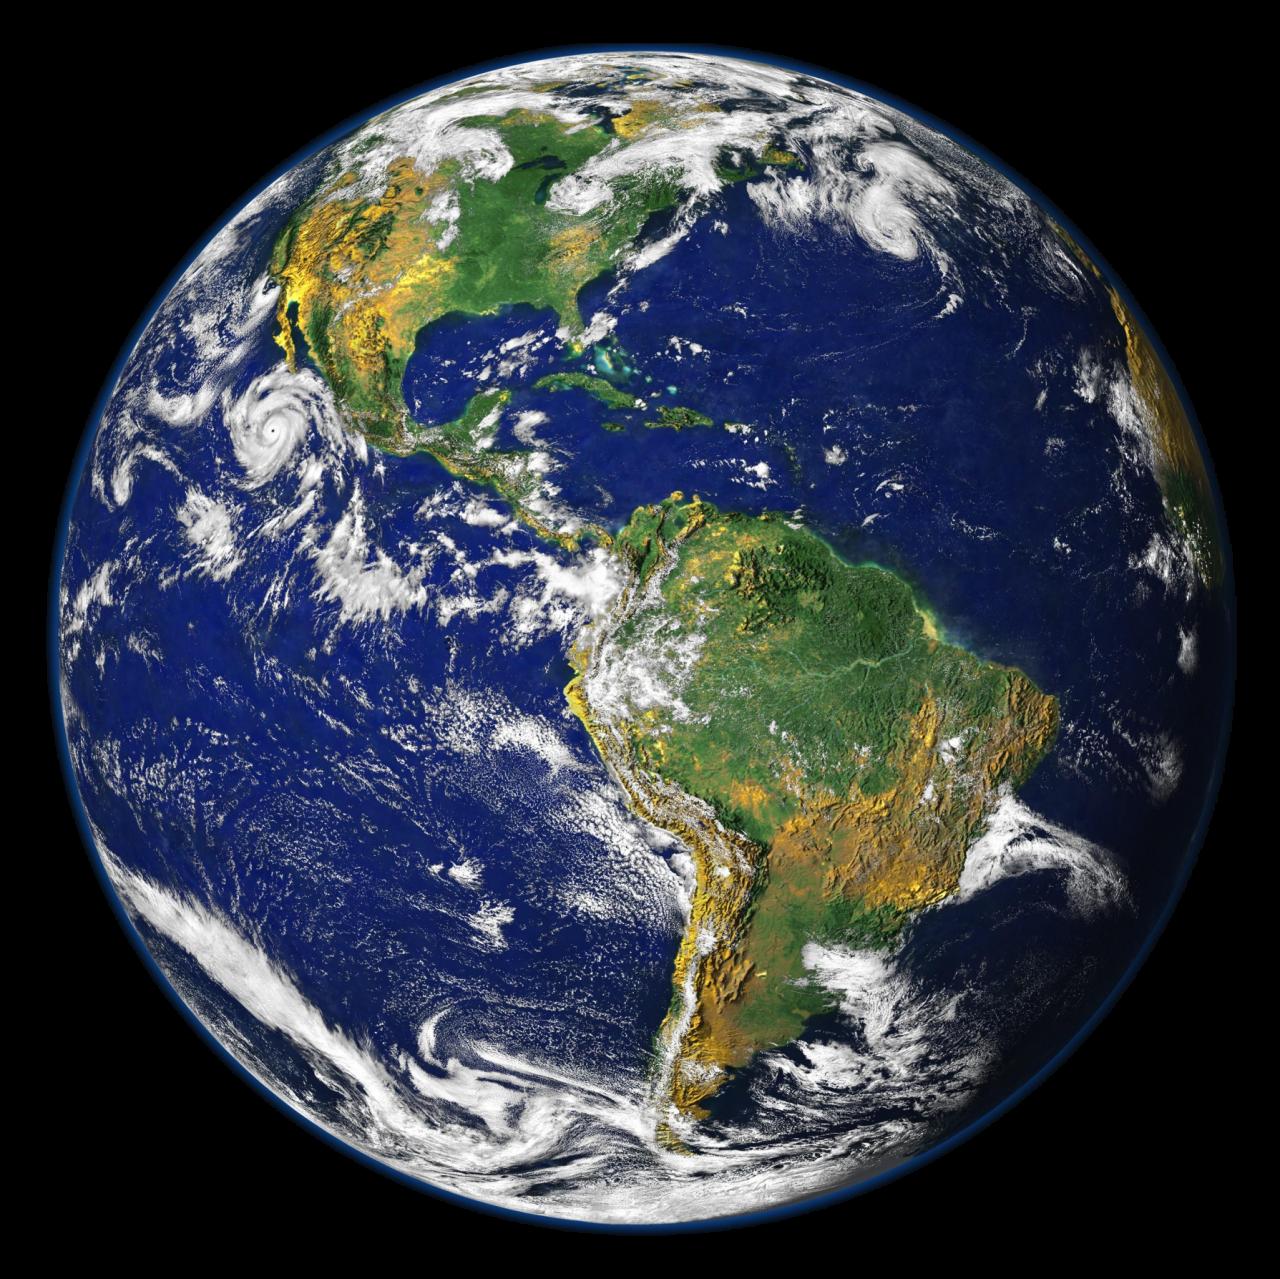 Satellite image of Europe and Africa globe - £25.50